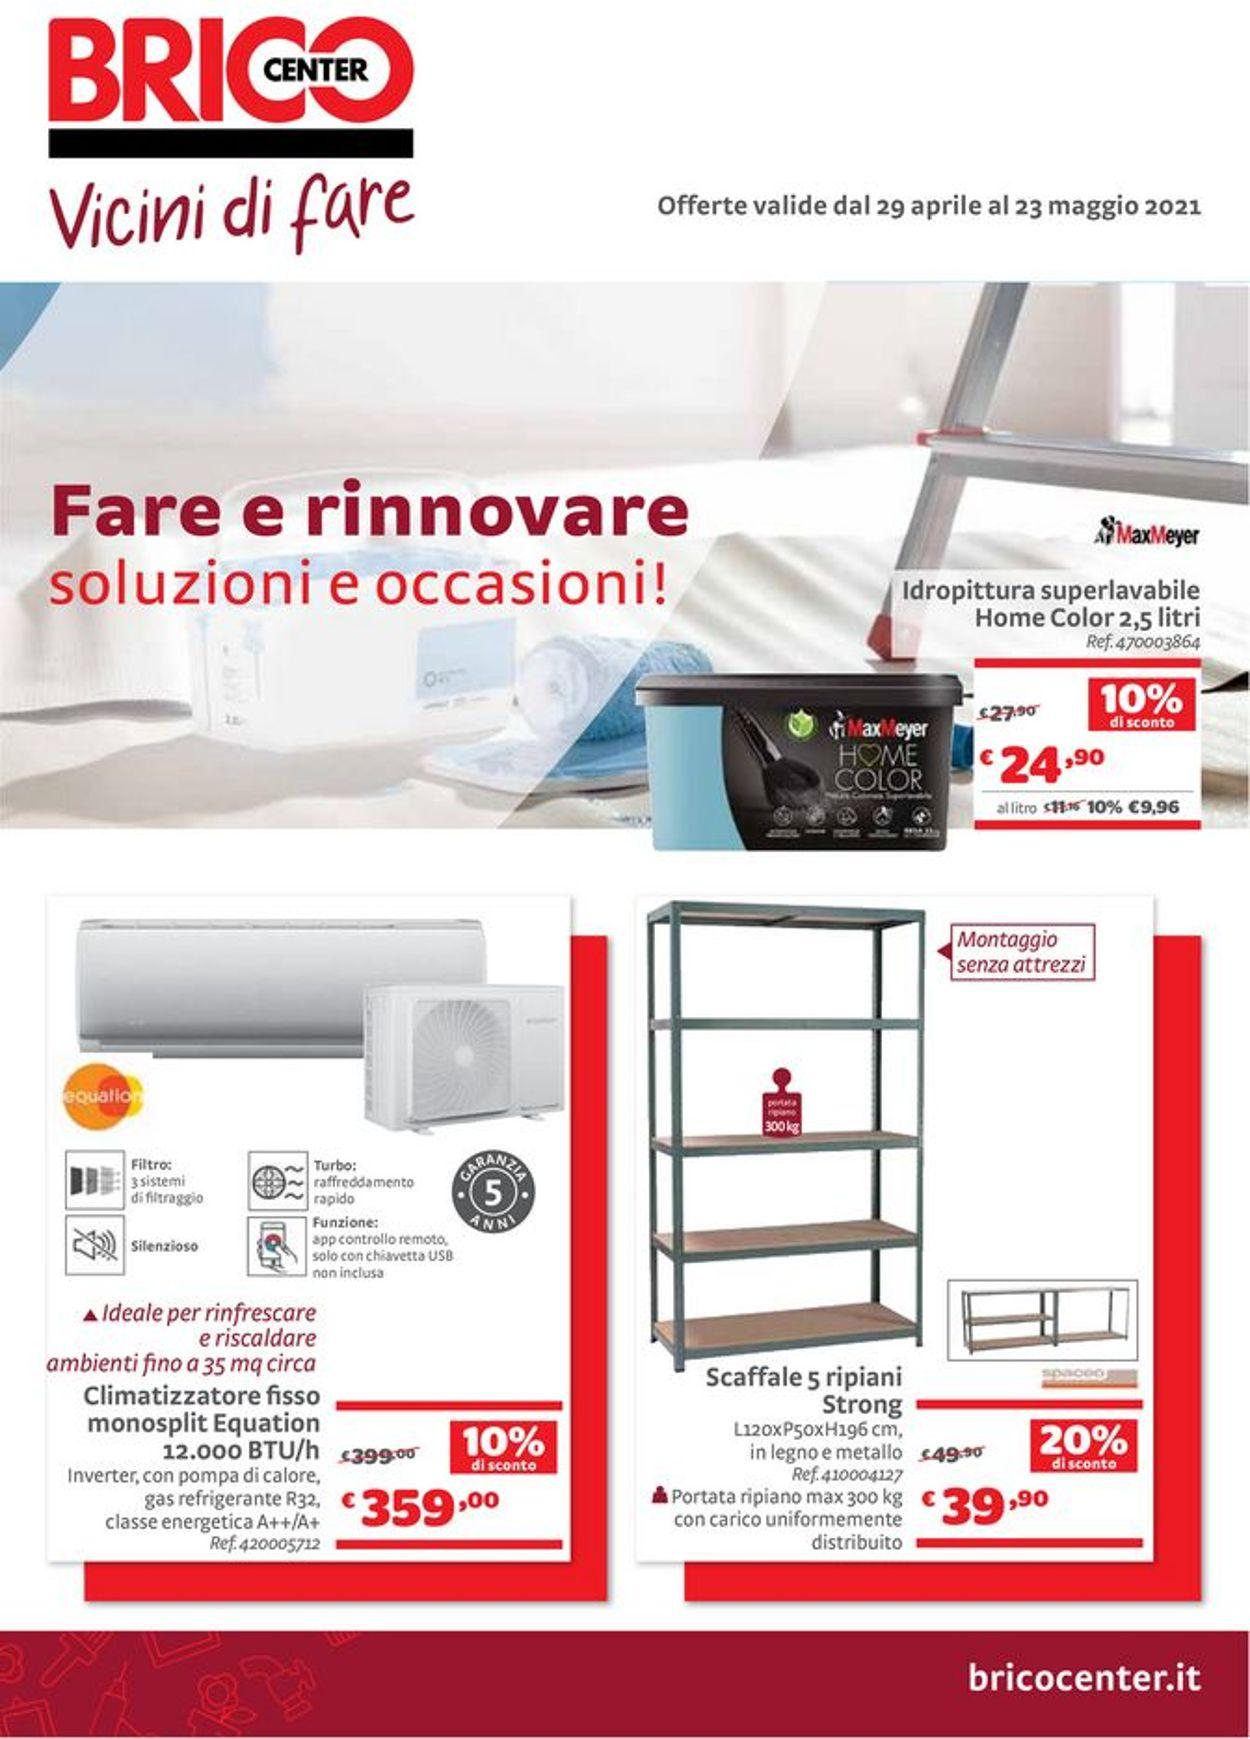 Volantino Bricocenter - Offerte 29/04-23/05/2021